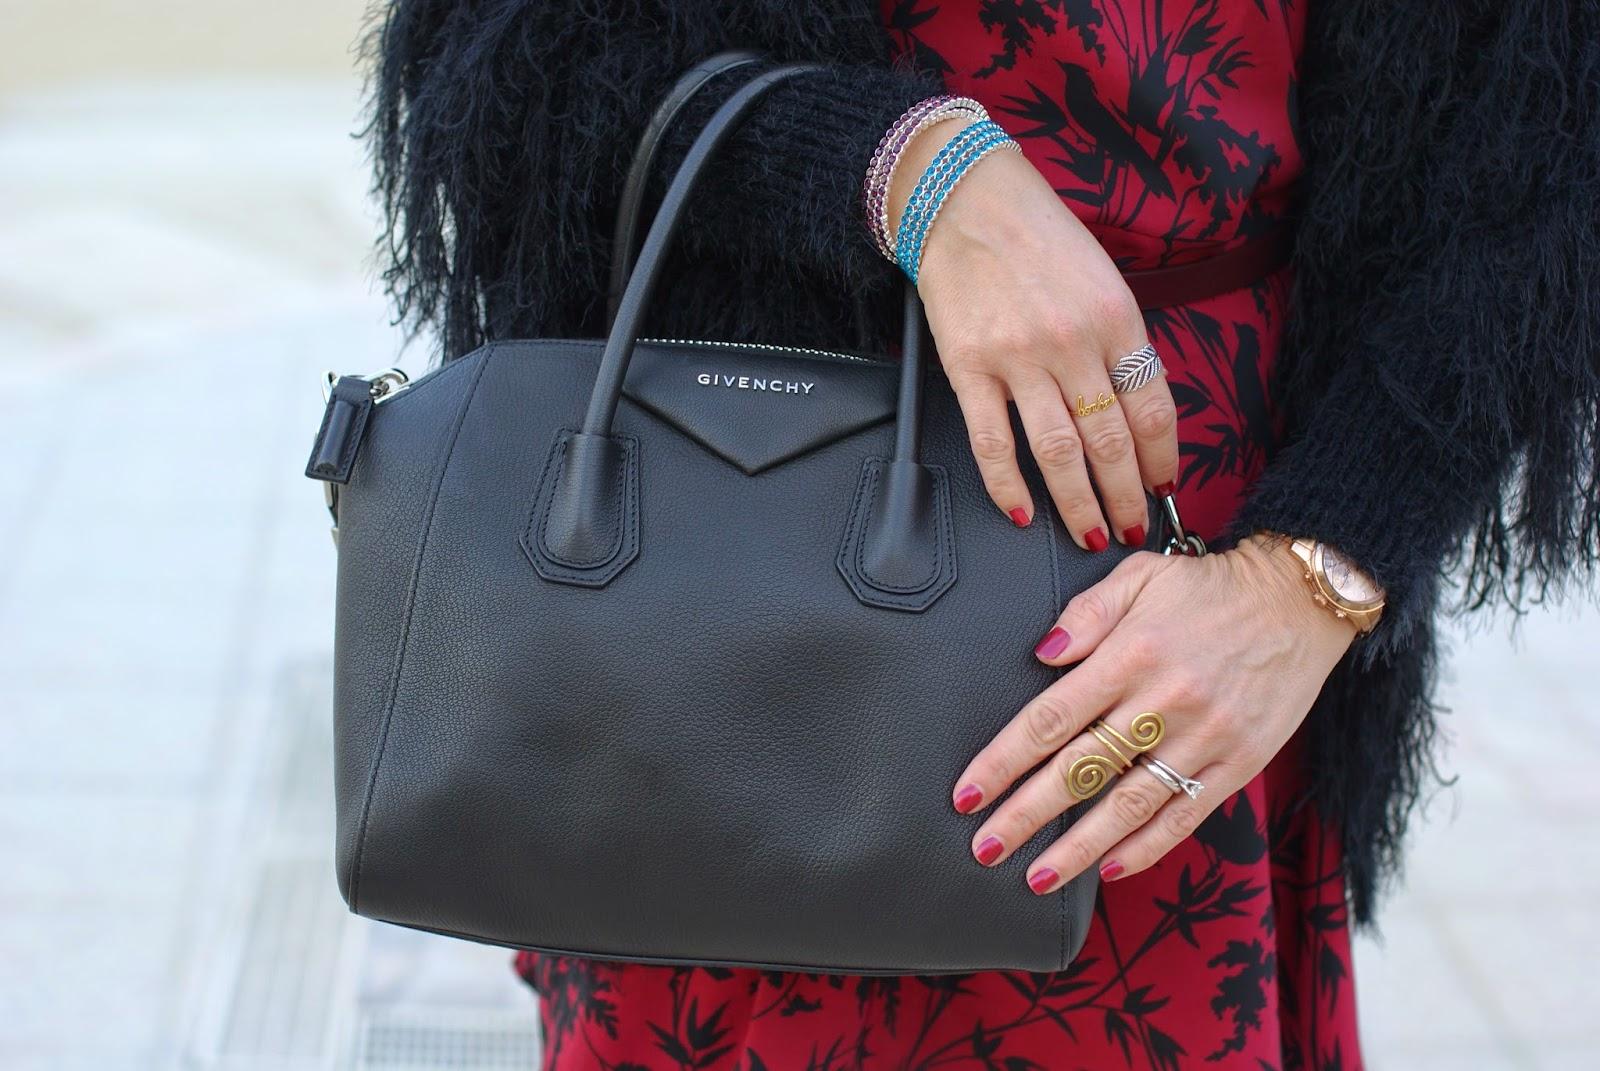 Givenchy Antigona bag, Fashion and Cookies, fashion blogger